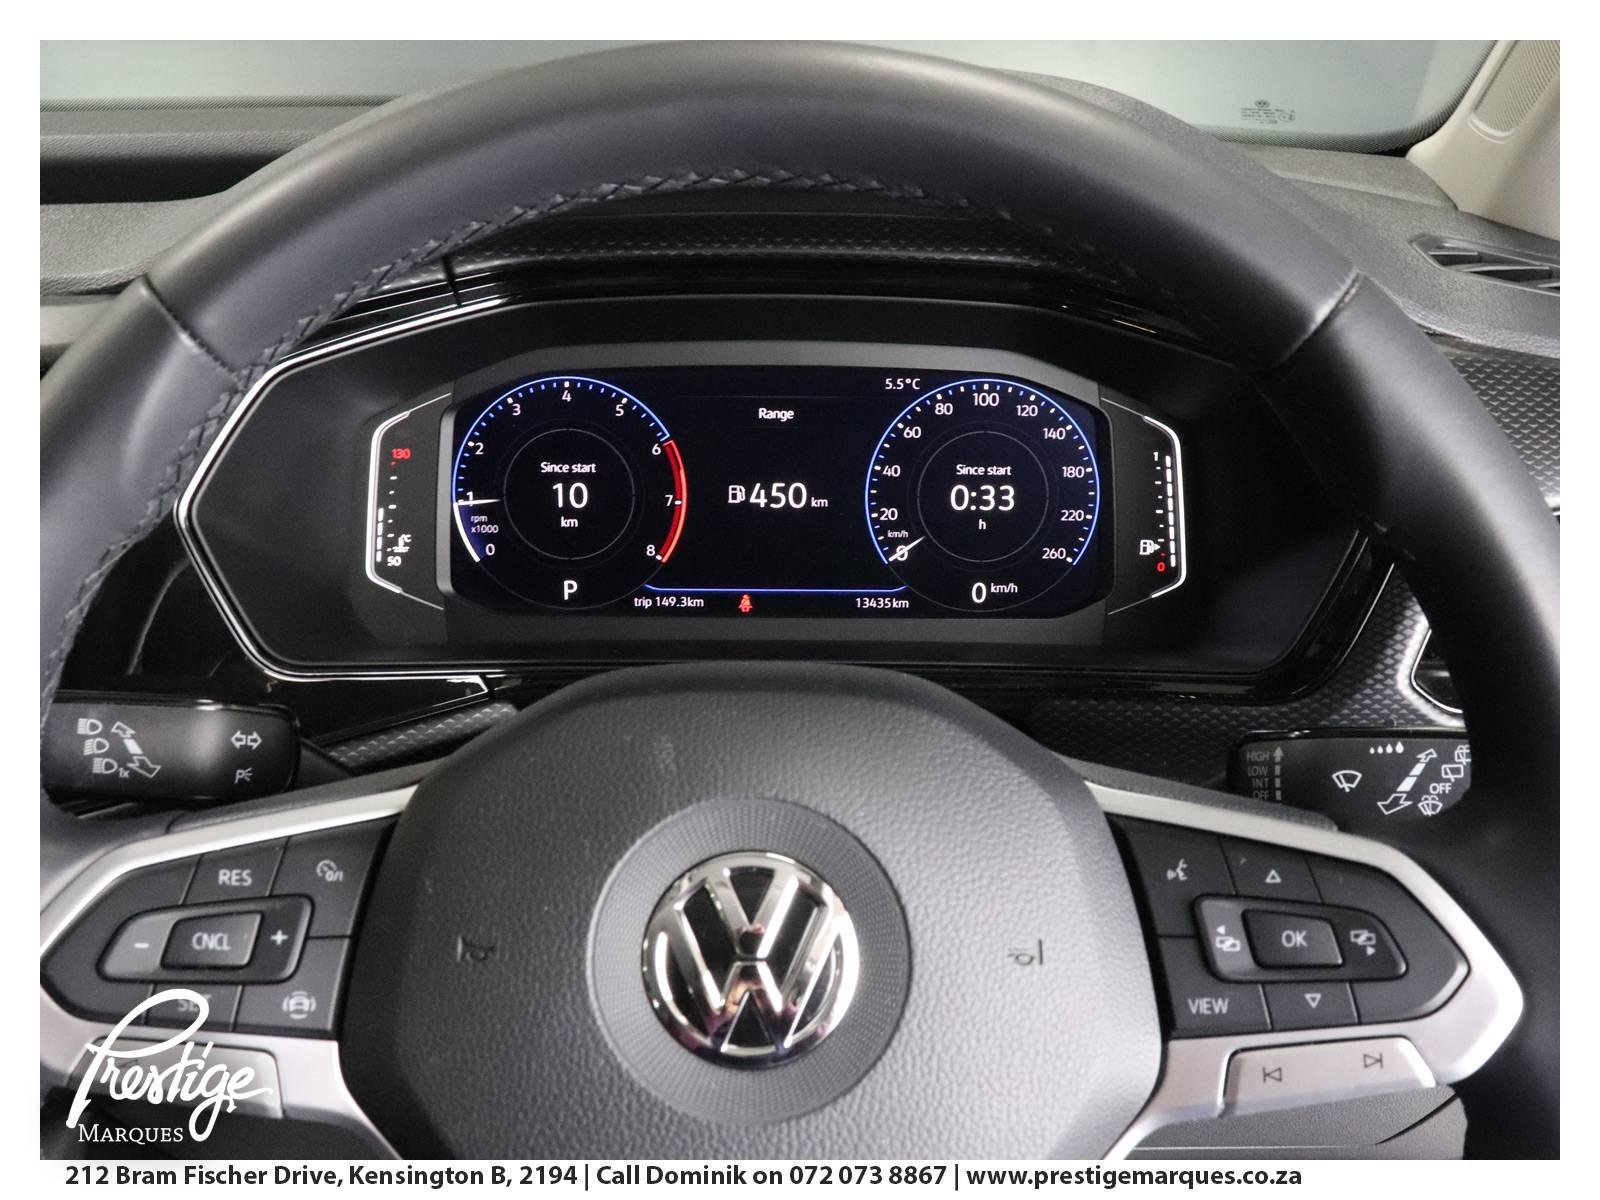 2019-Volkswagen-T-Cross-Prestige-Marques-Randburg-Sandton-13